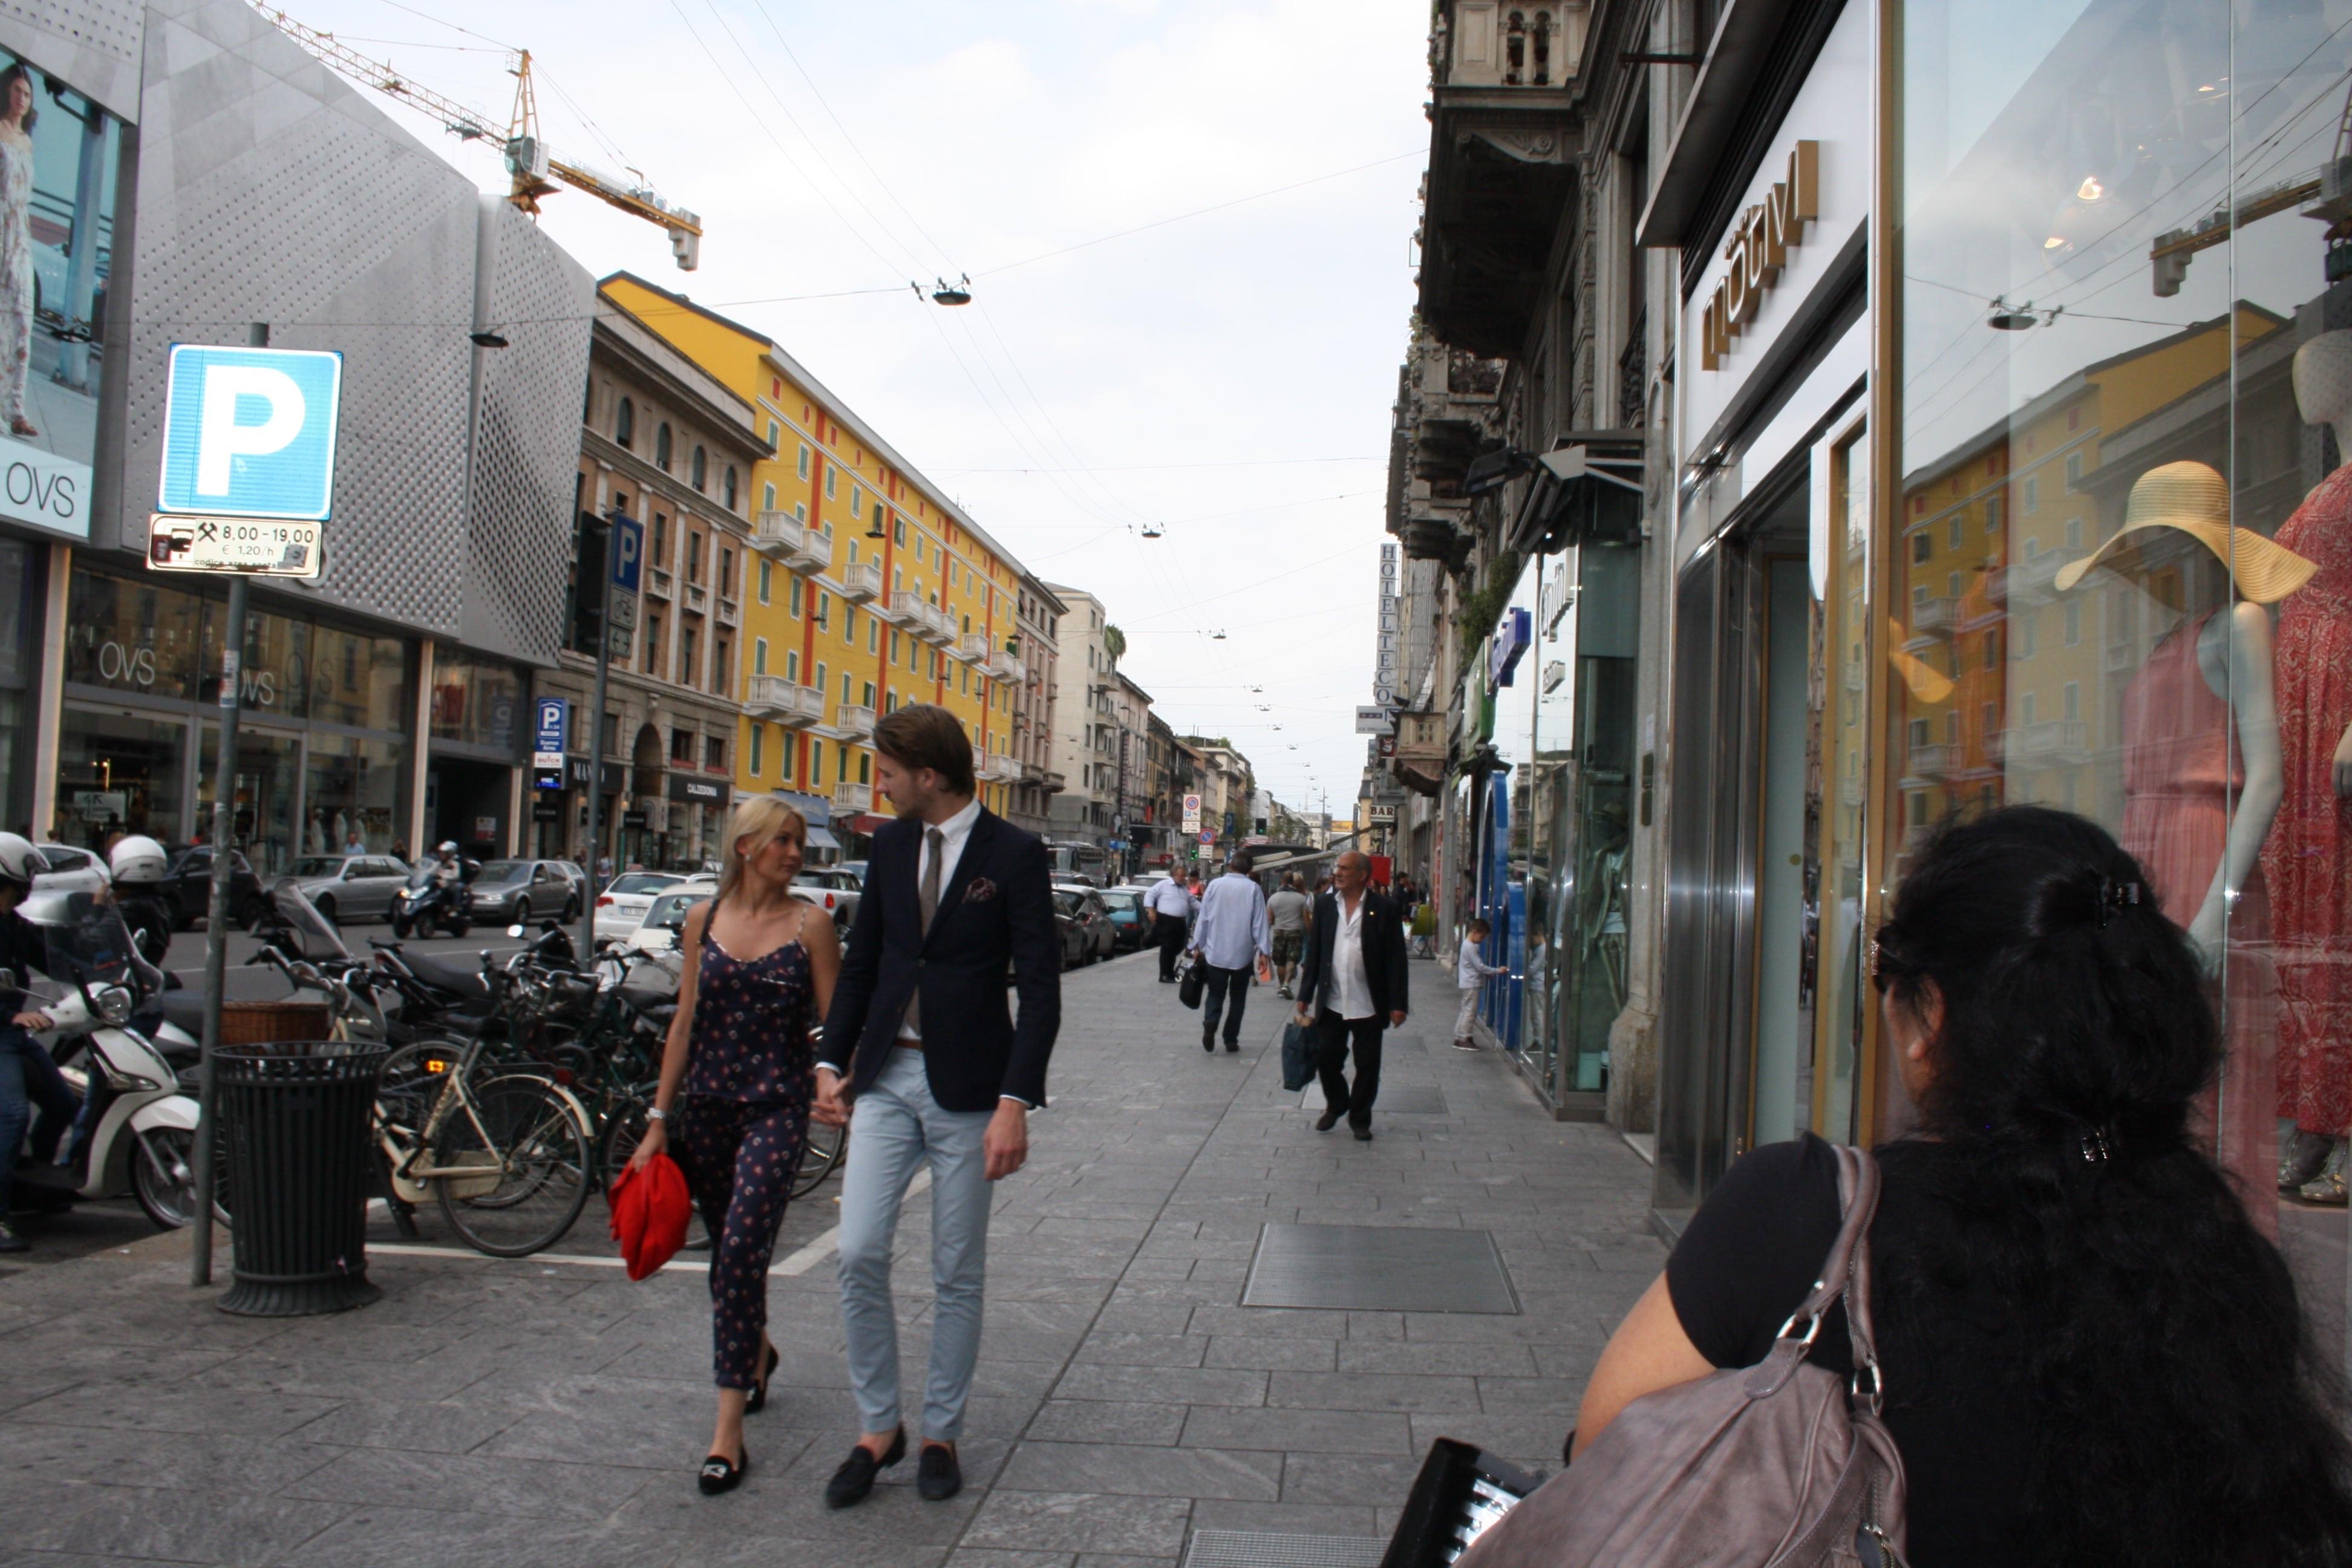 Movement in Milan